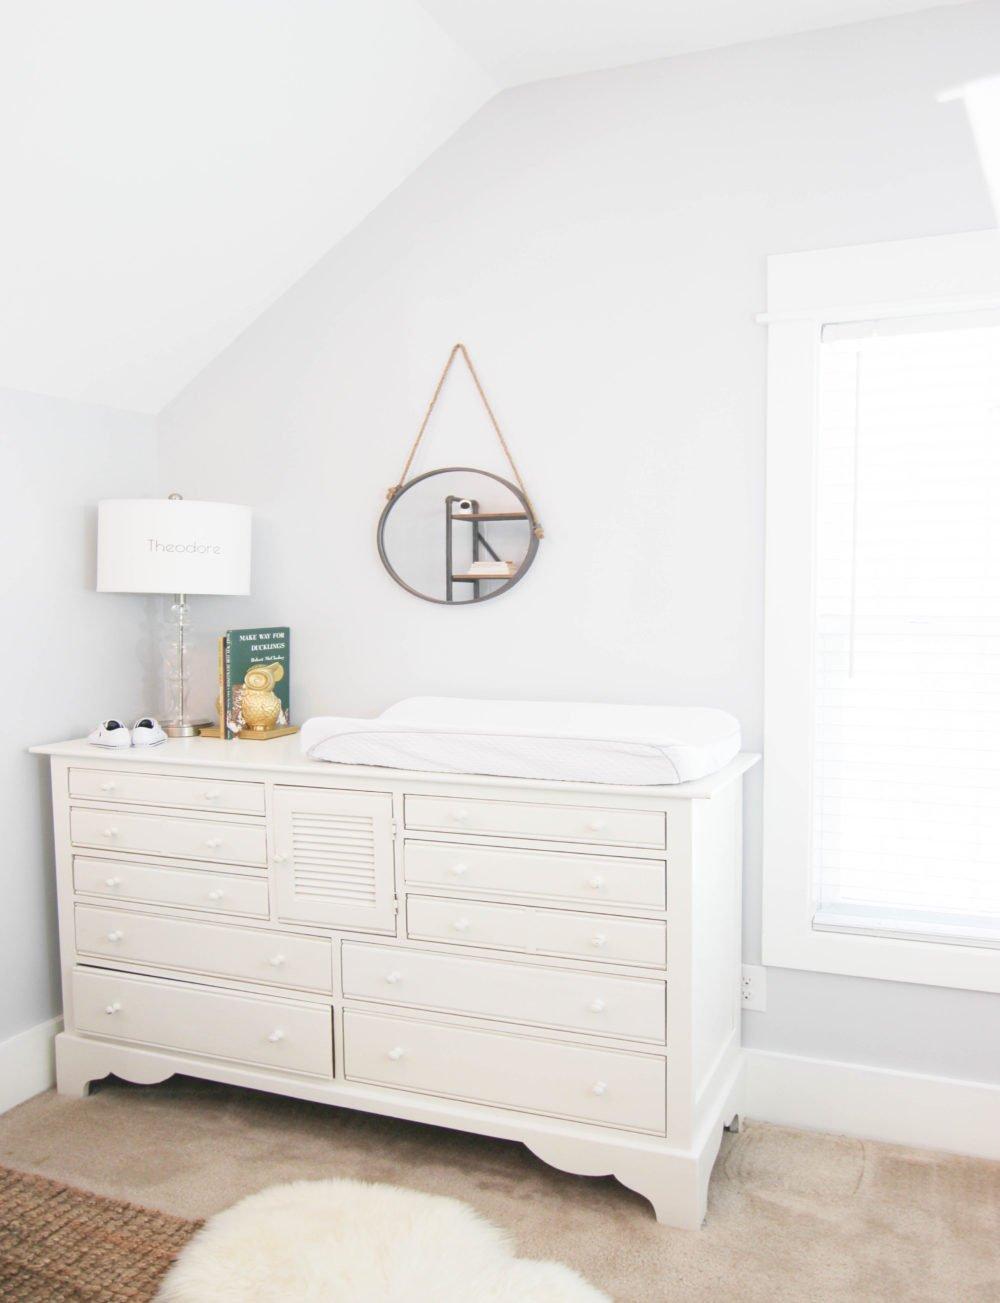 Transform Dresser Into Stylish Changing Table